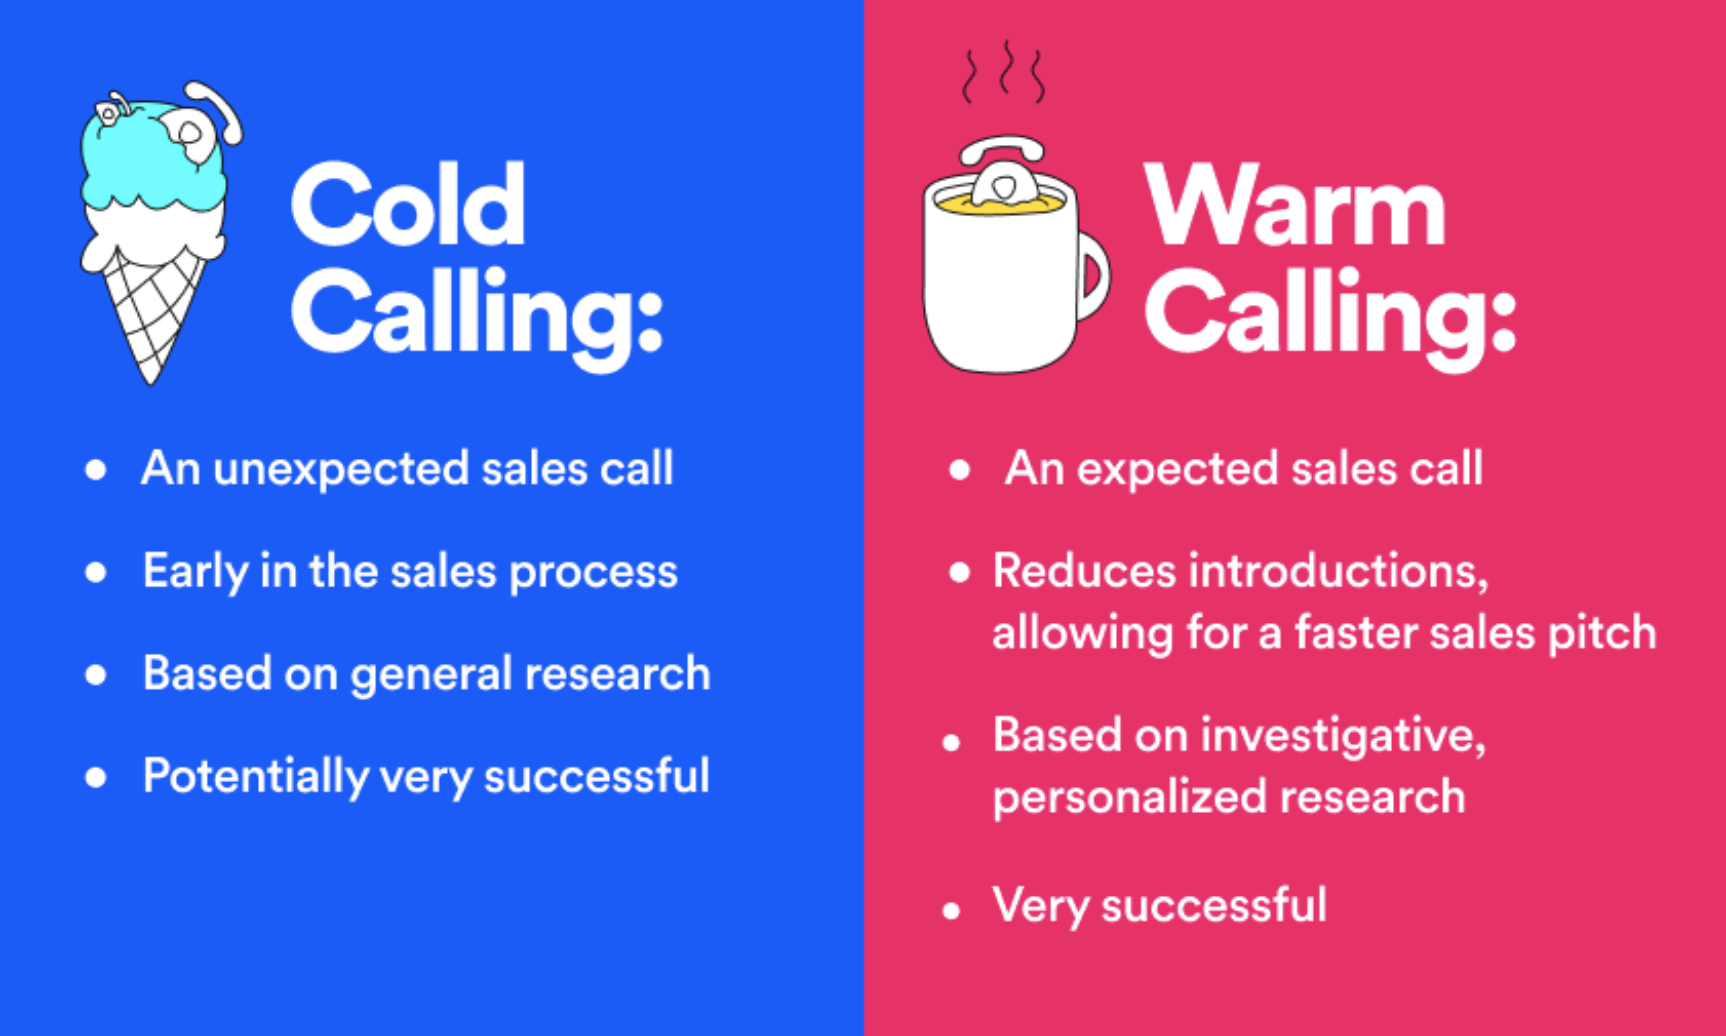 cold calling vs warm calling